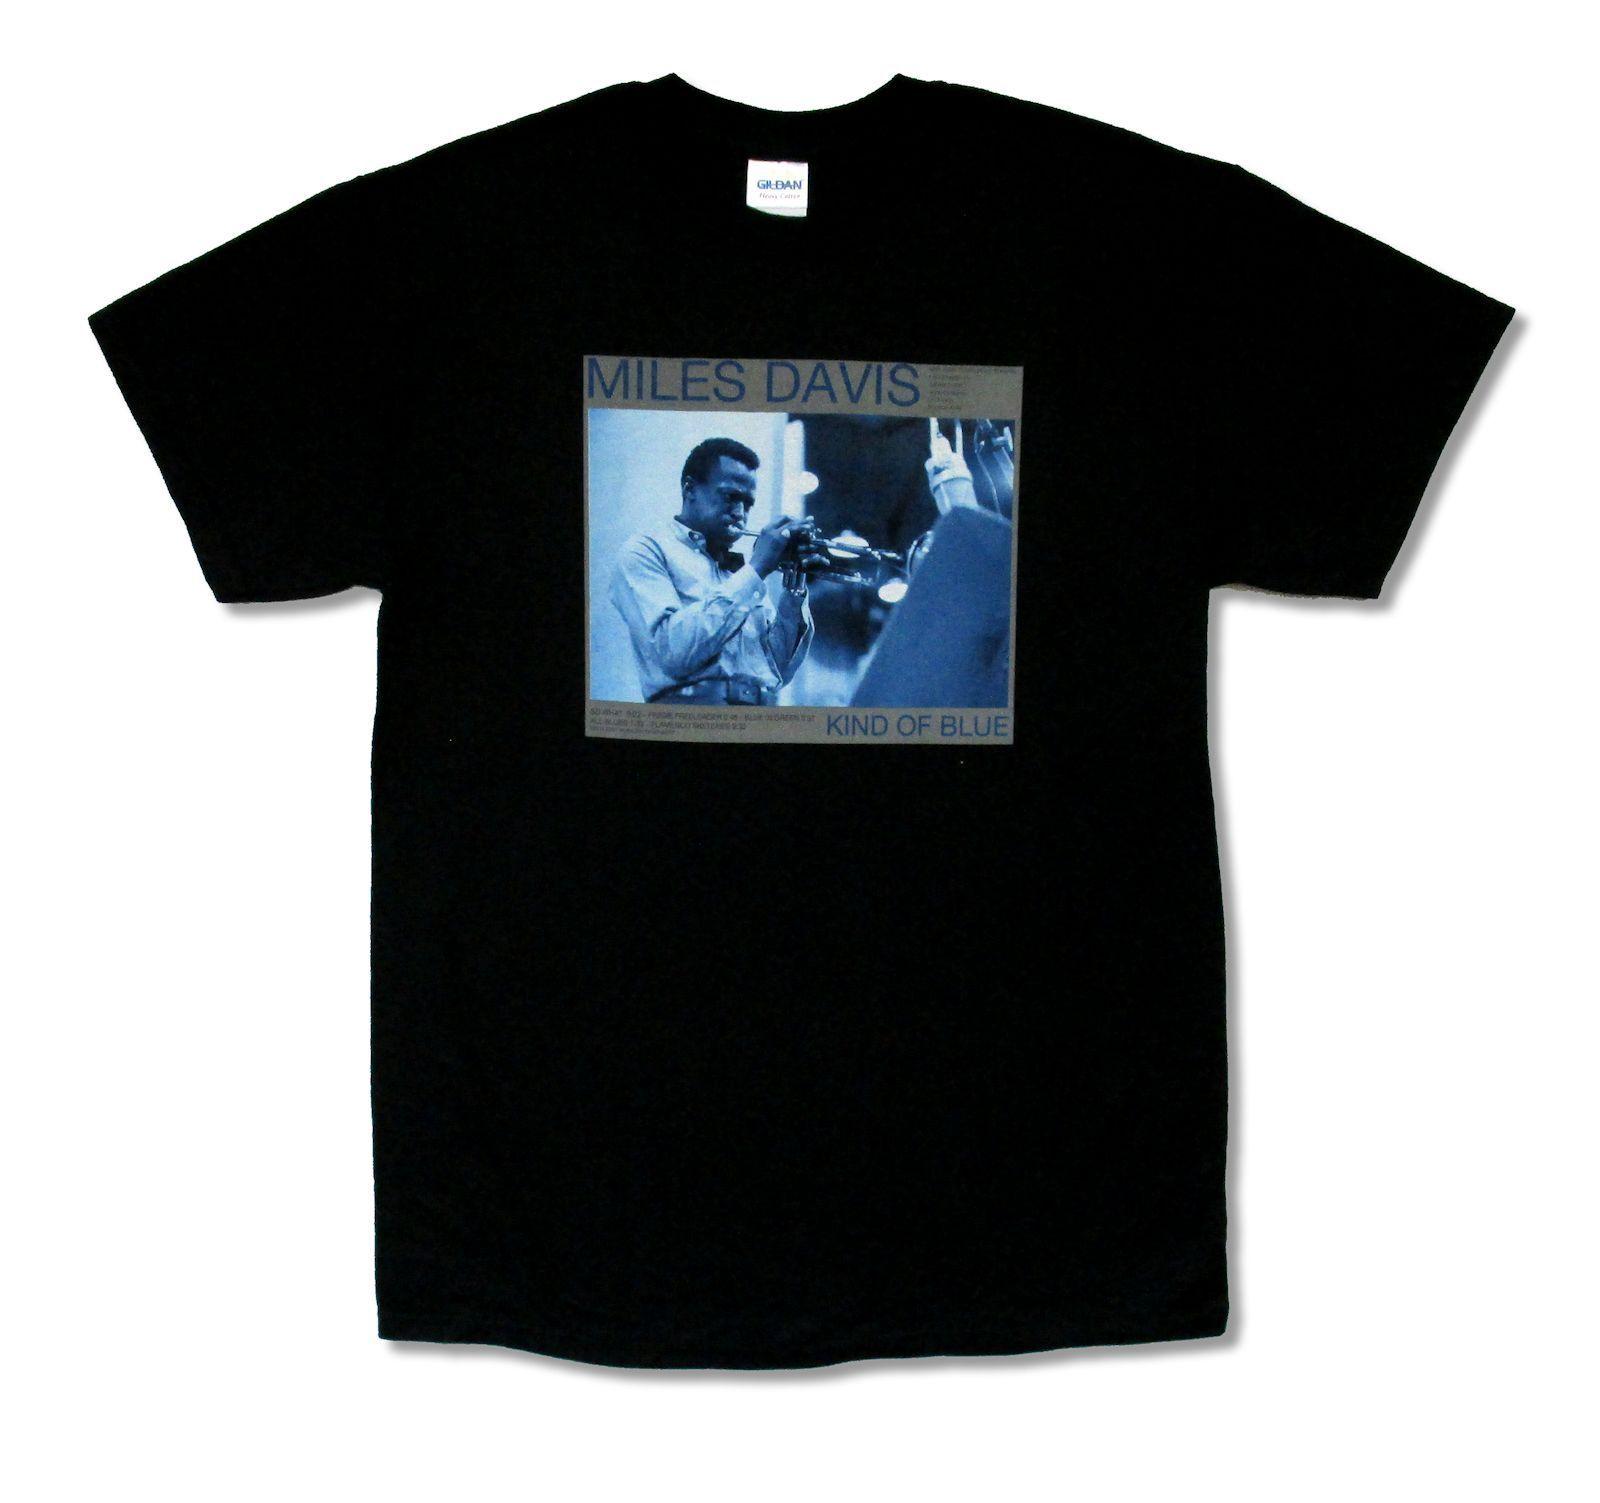 "MILES DAVIS ""KIND OF BLUE"" BLACK T-SHIRT NEW OFFICIAL ADULT JAZZ BAND MUSIC Print T Shirt Summer Short Sleeve Harajuku Tops"